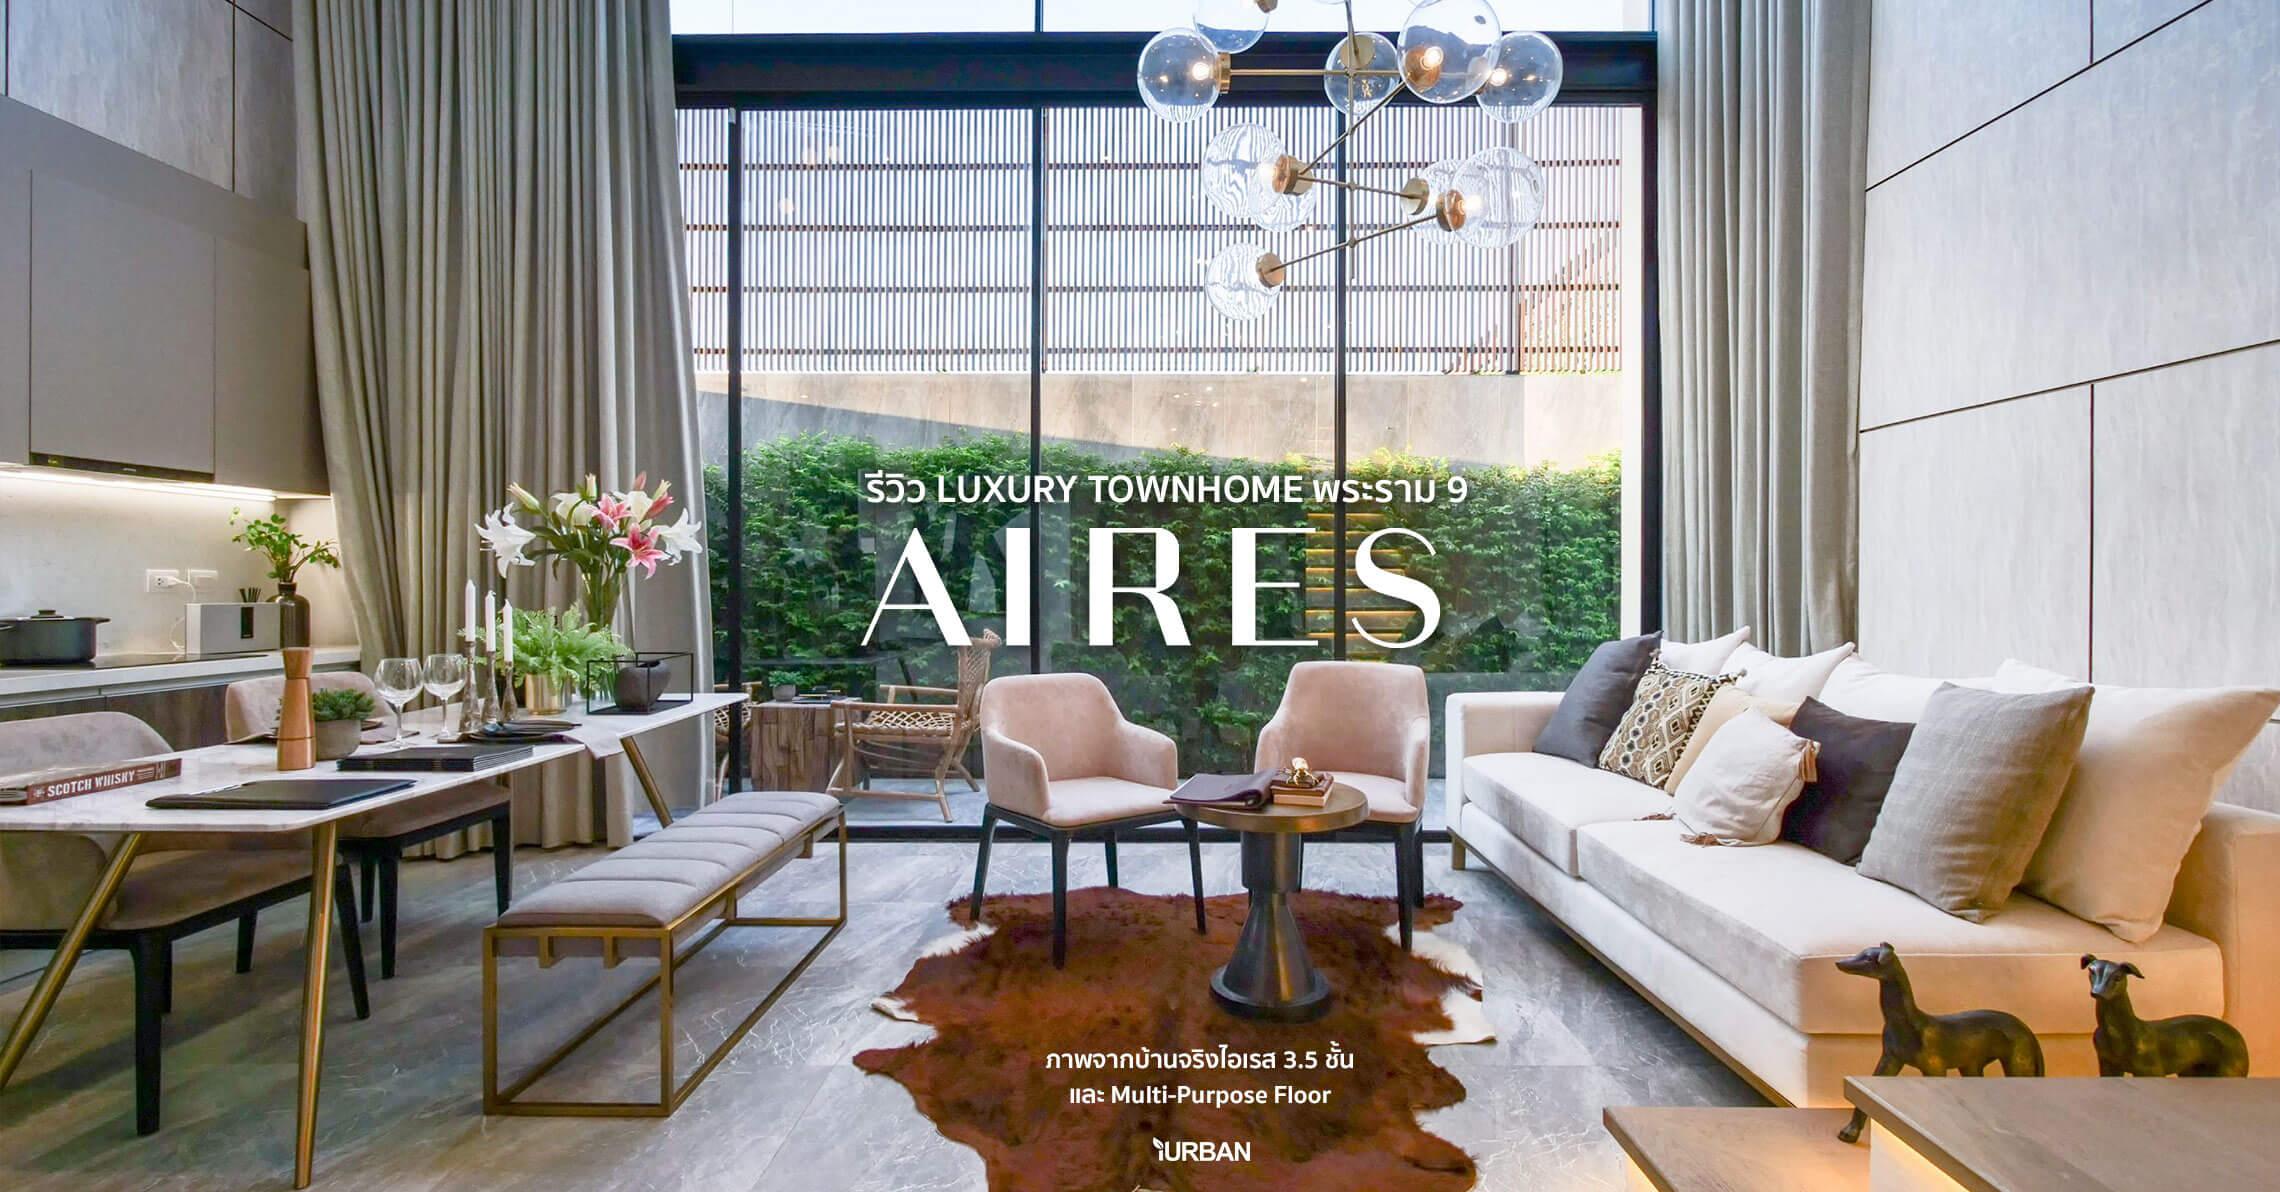 AIRES RAMA9 รีวิว Luxury Townhome 3.5 ชั้น + Rooftop ออกแบบสวย ย่านพระราม9 (ใกล้ รพ.สมิติเวช) 13 - AIRES